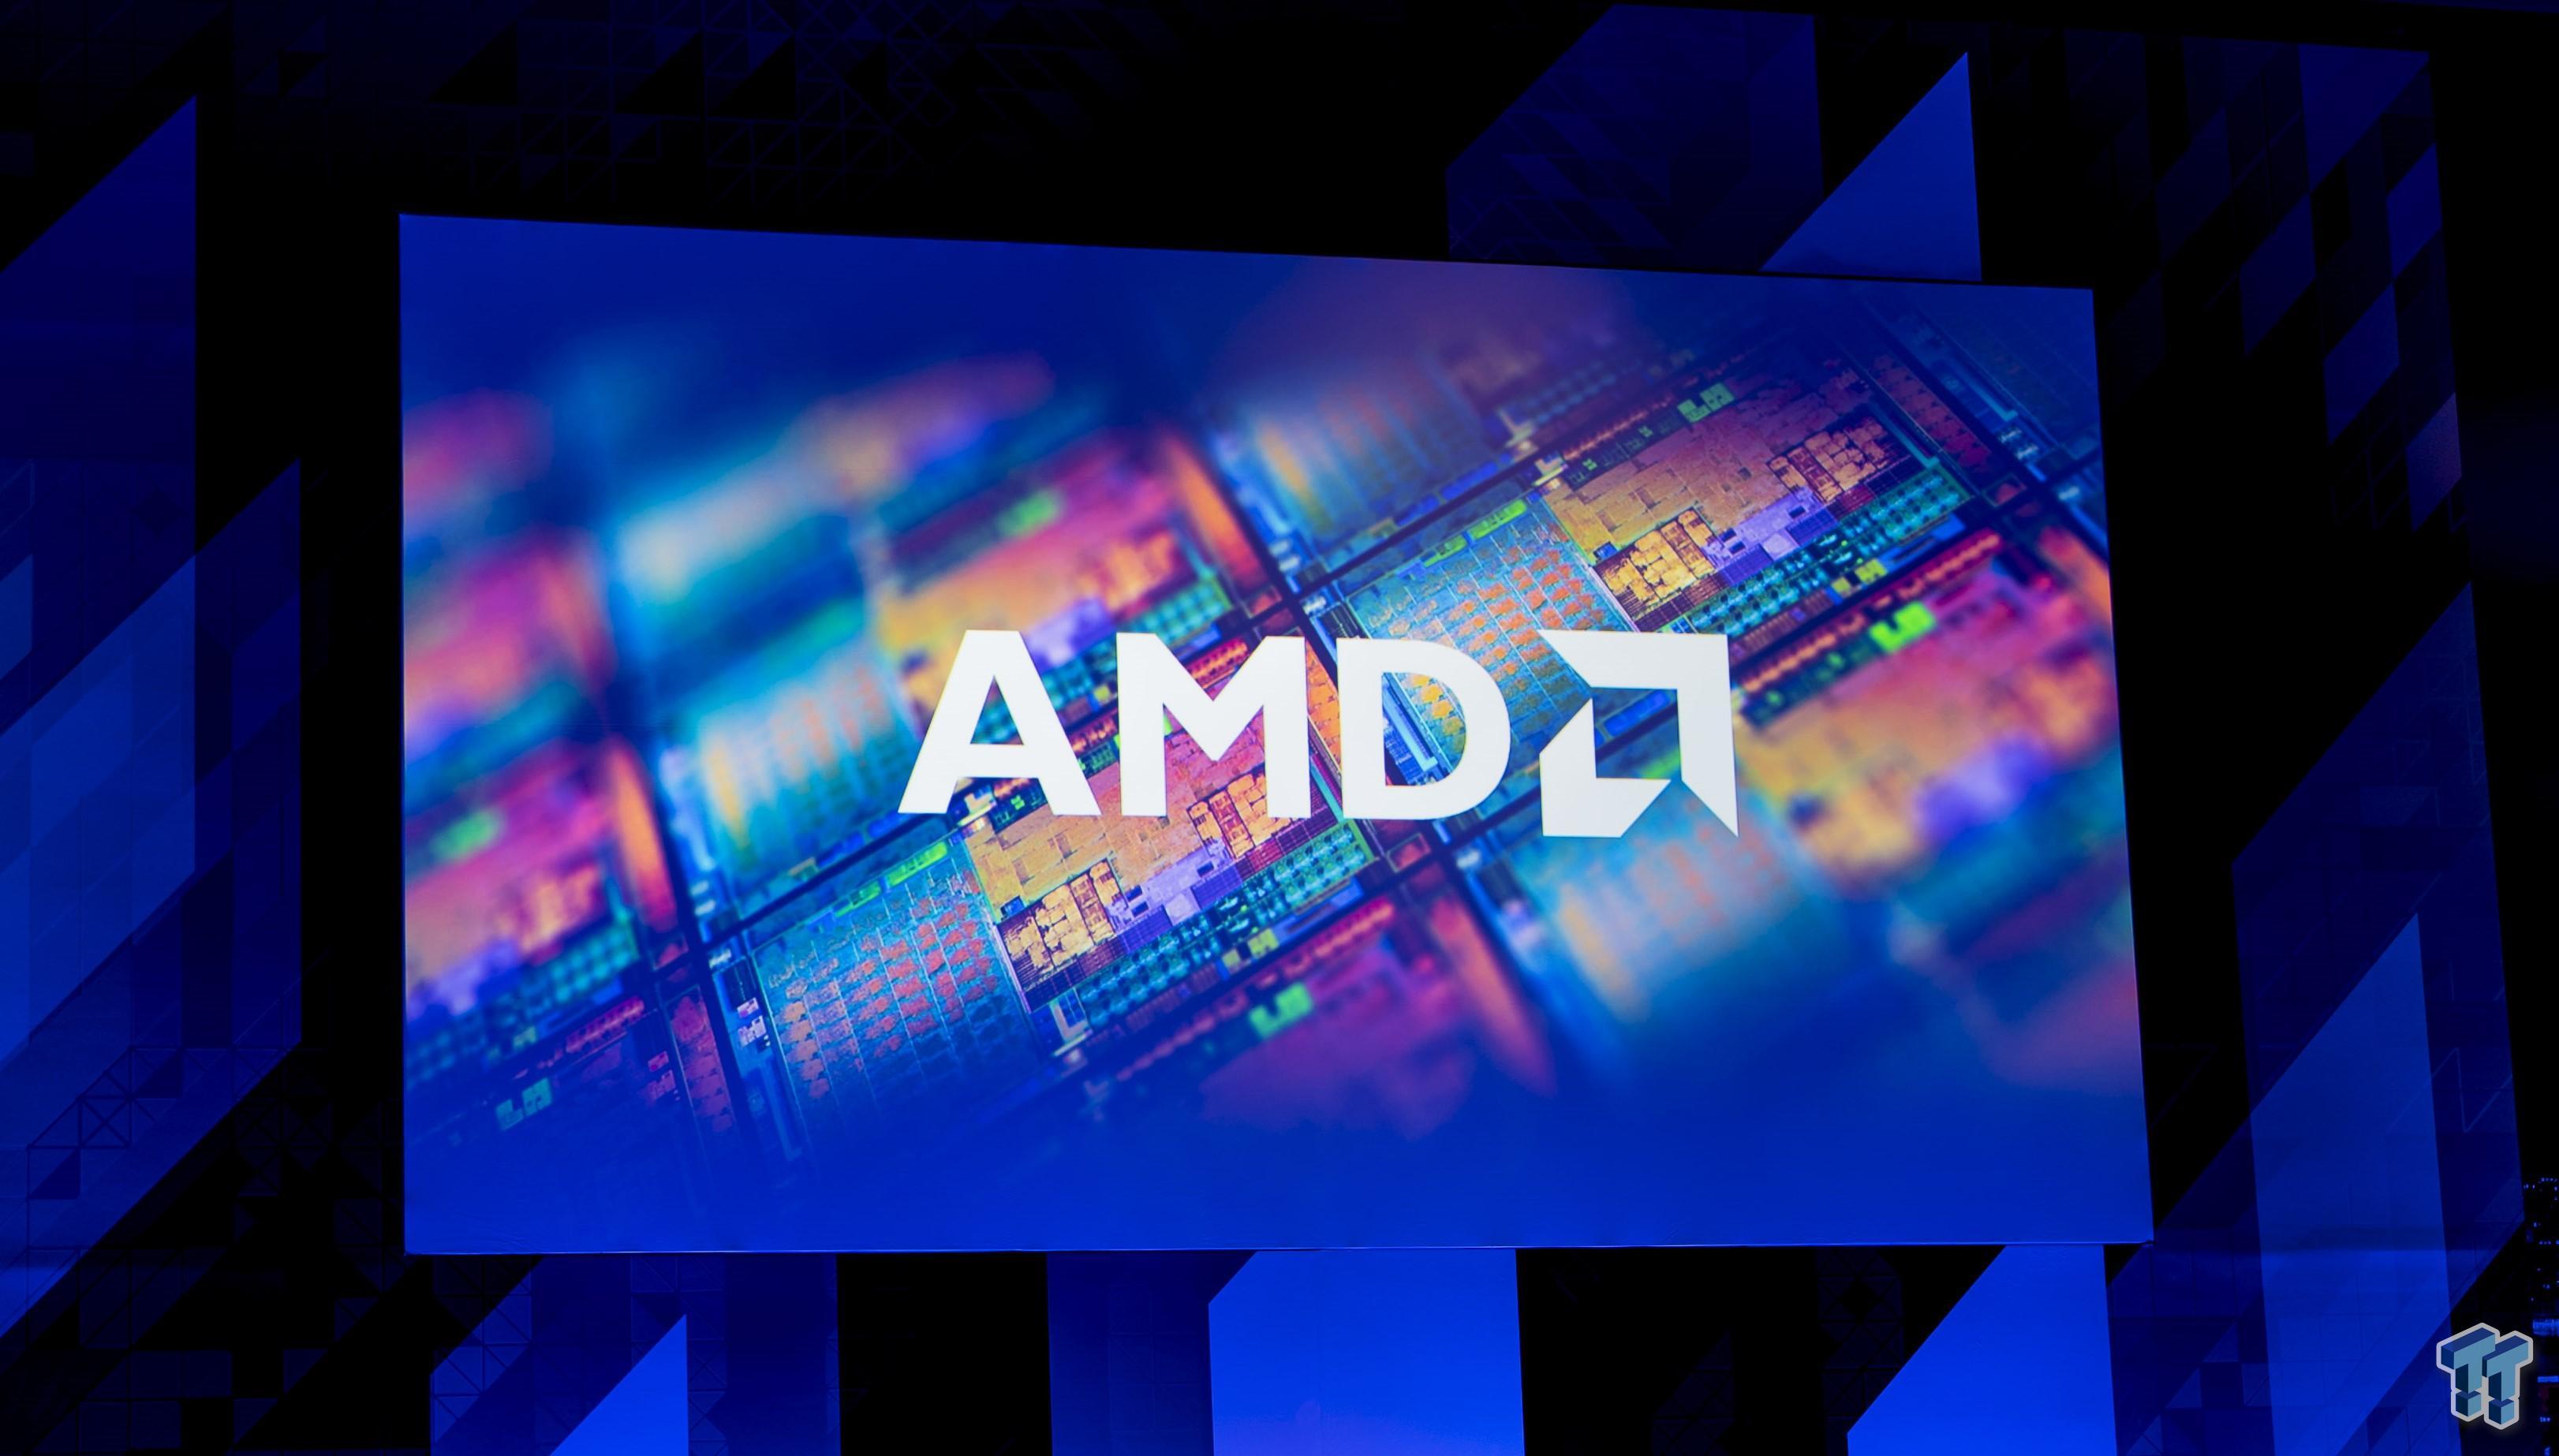 AMD Radeon RX Vega will arrive in 7 different models